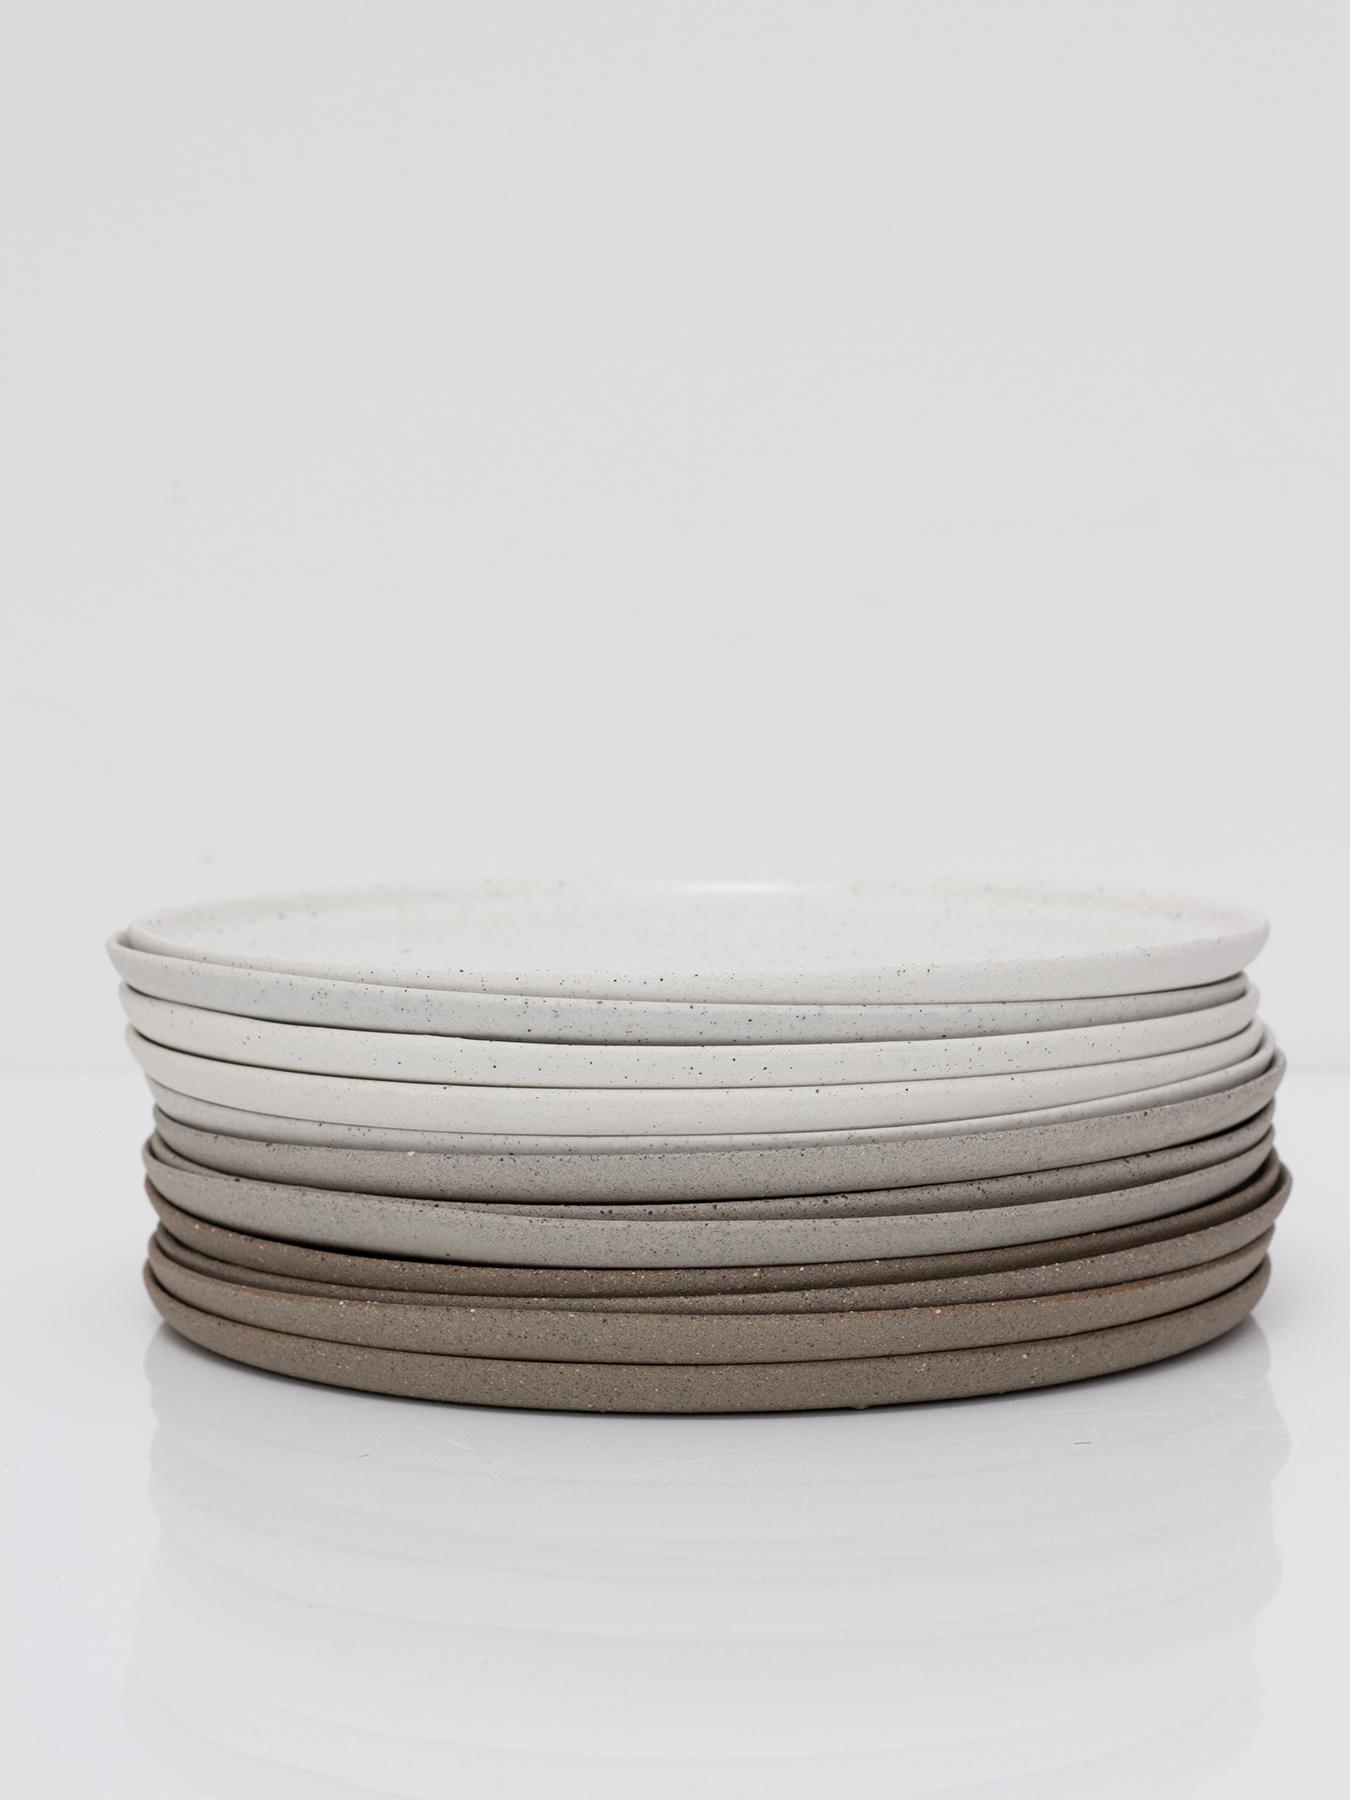 ceramic_big_plate_01